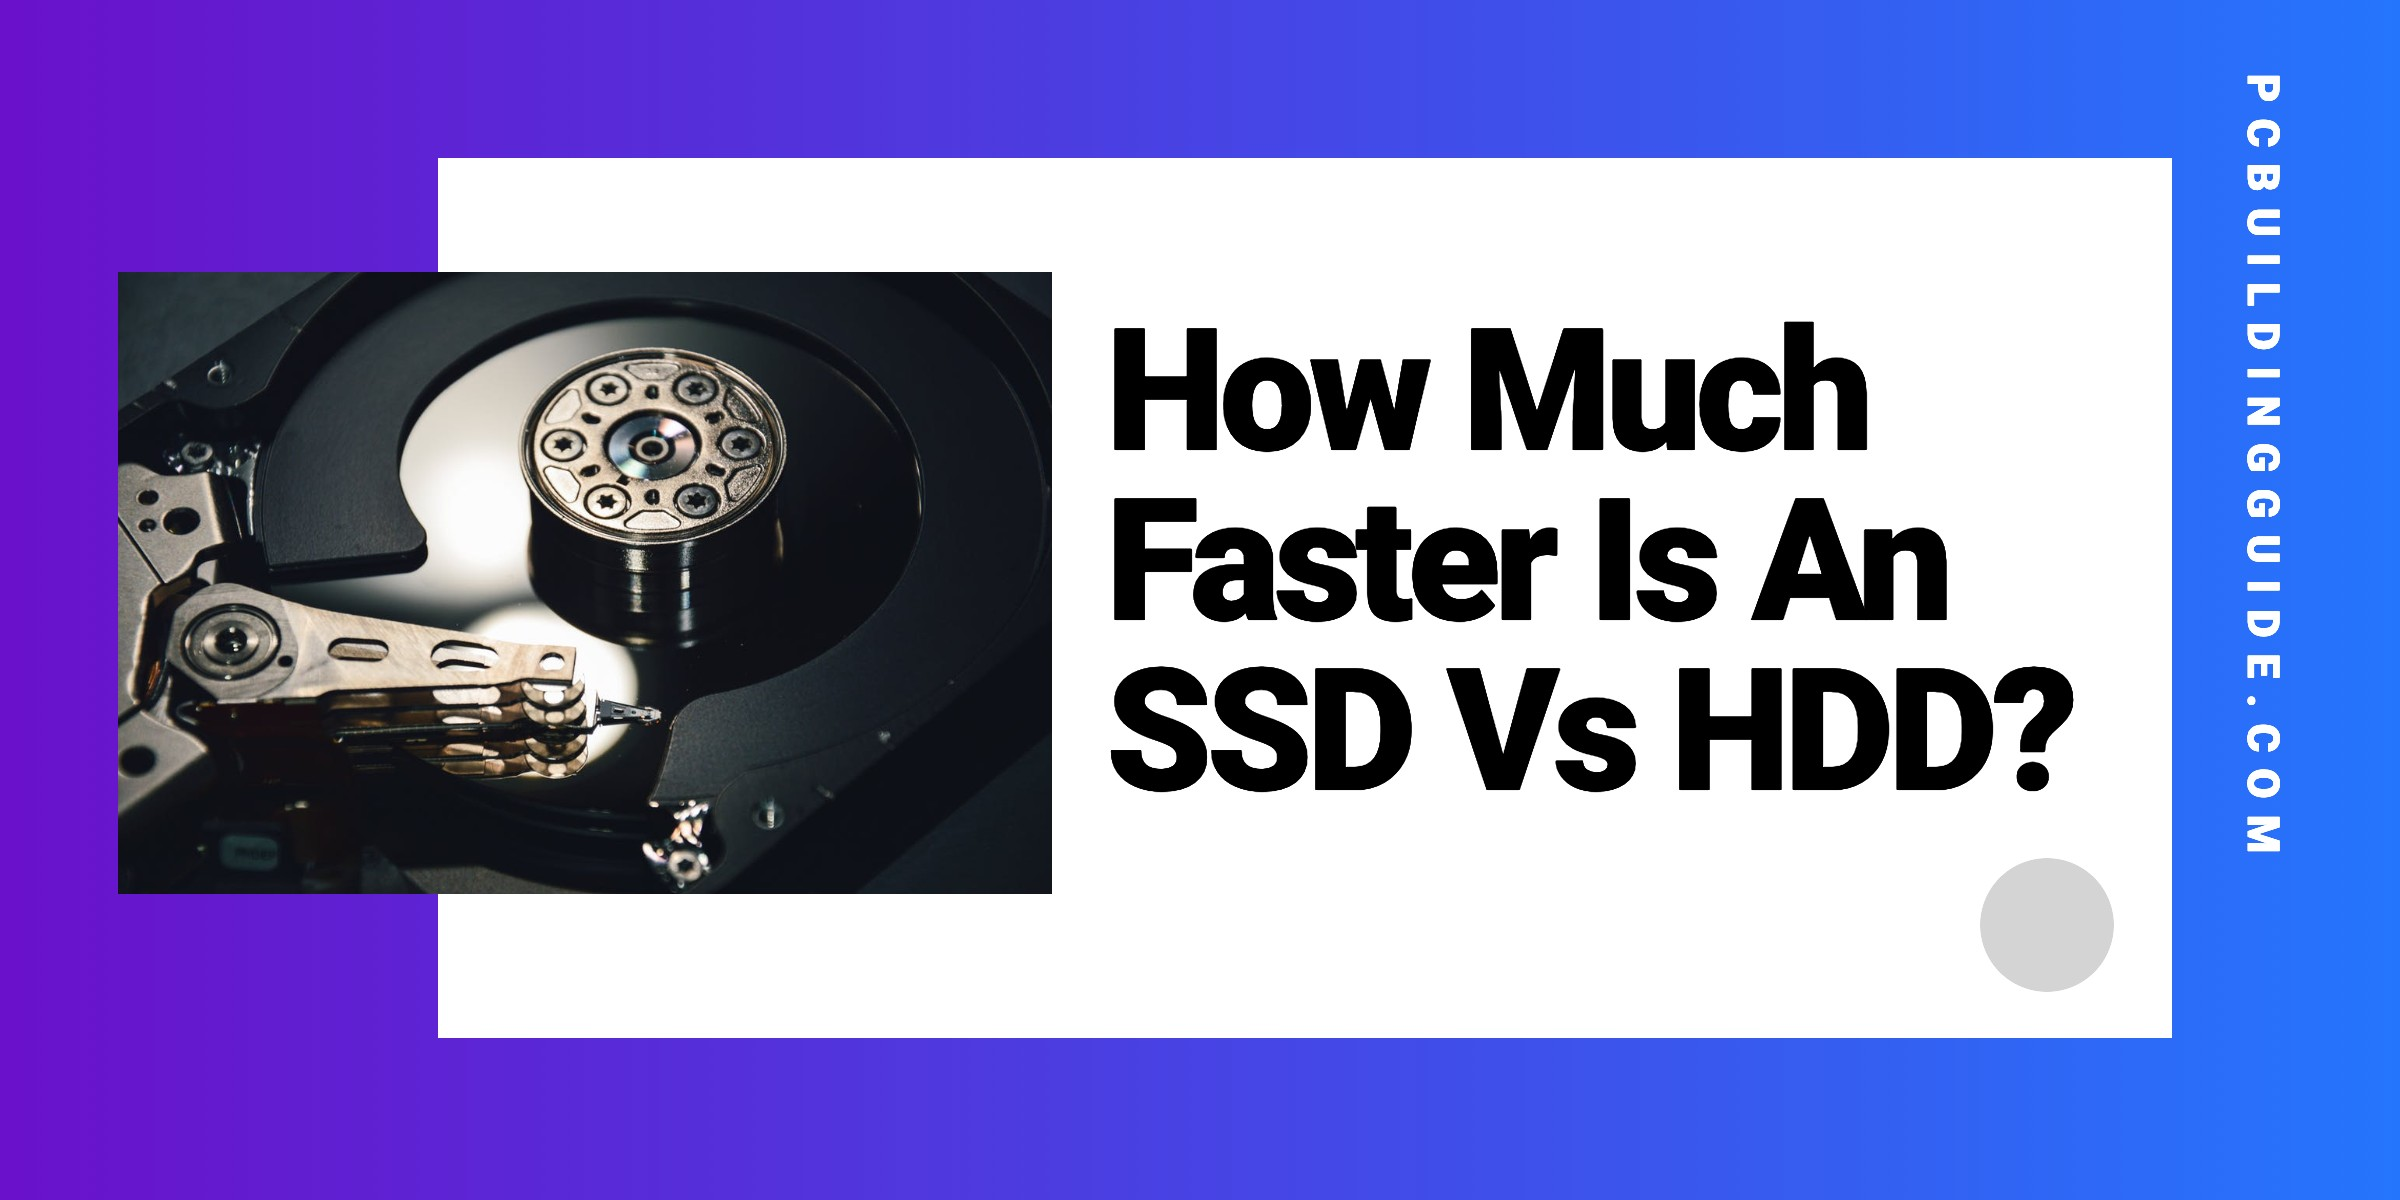 ssd vs hdd speed